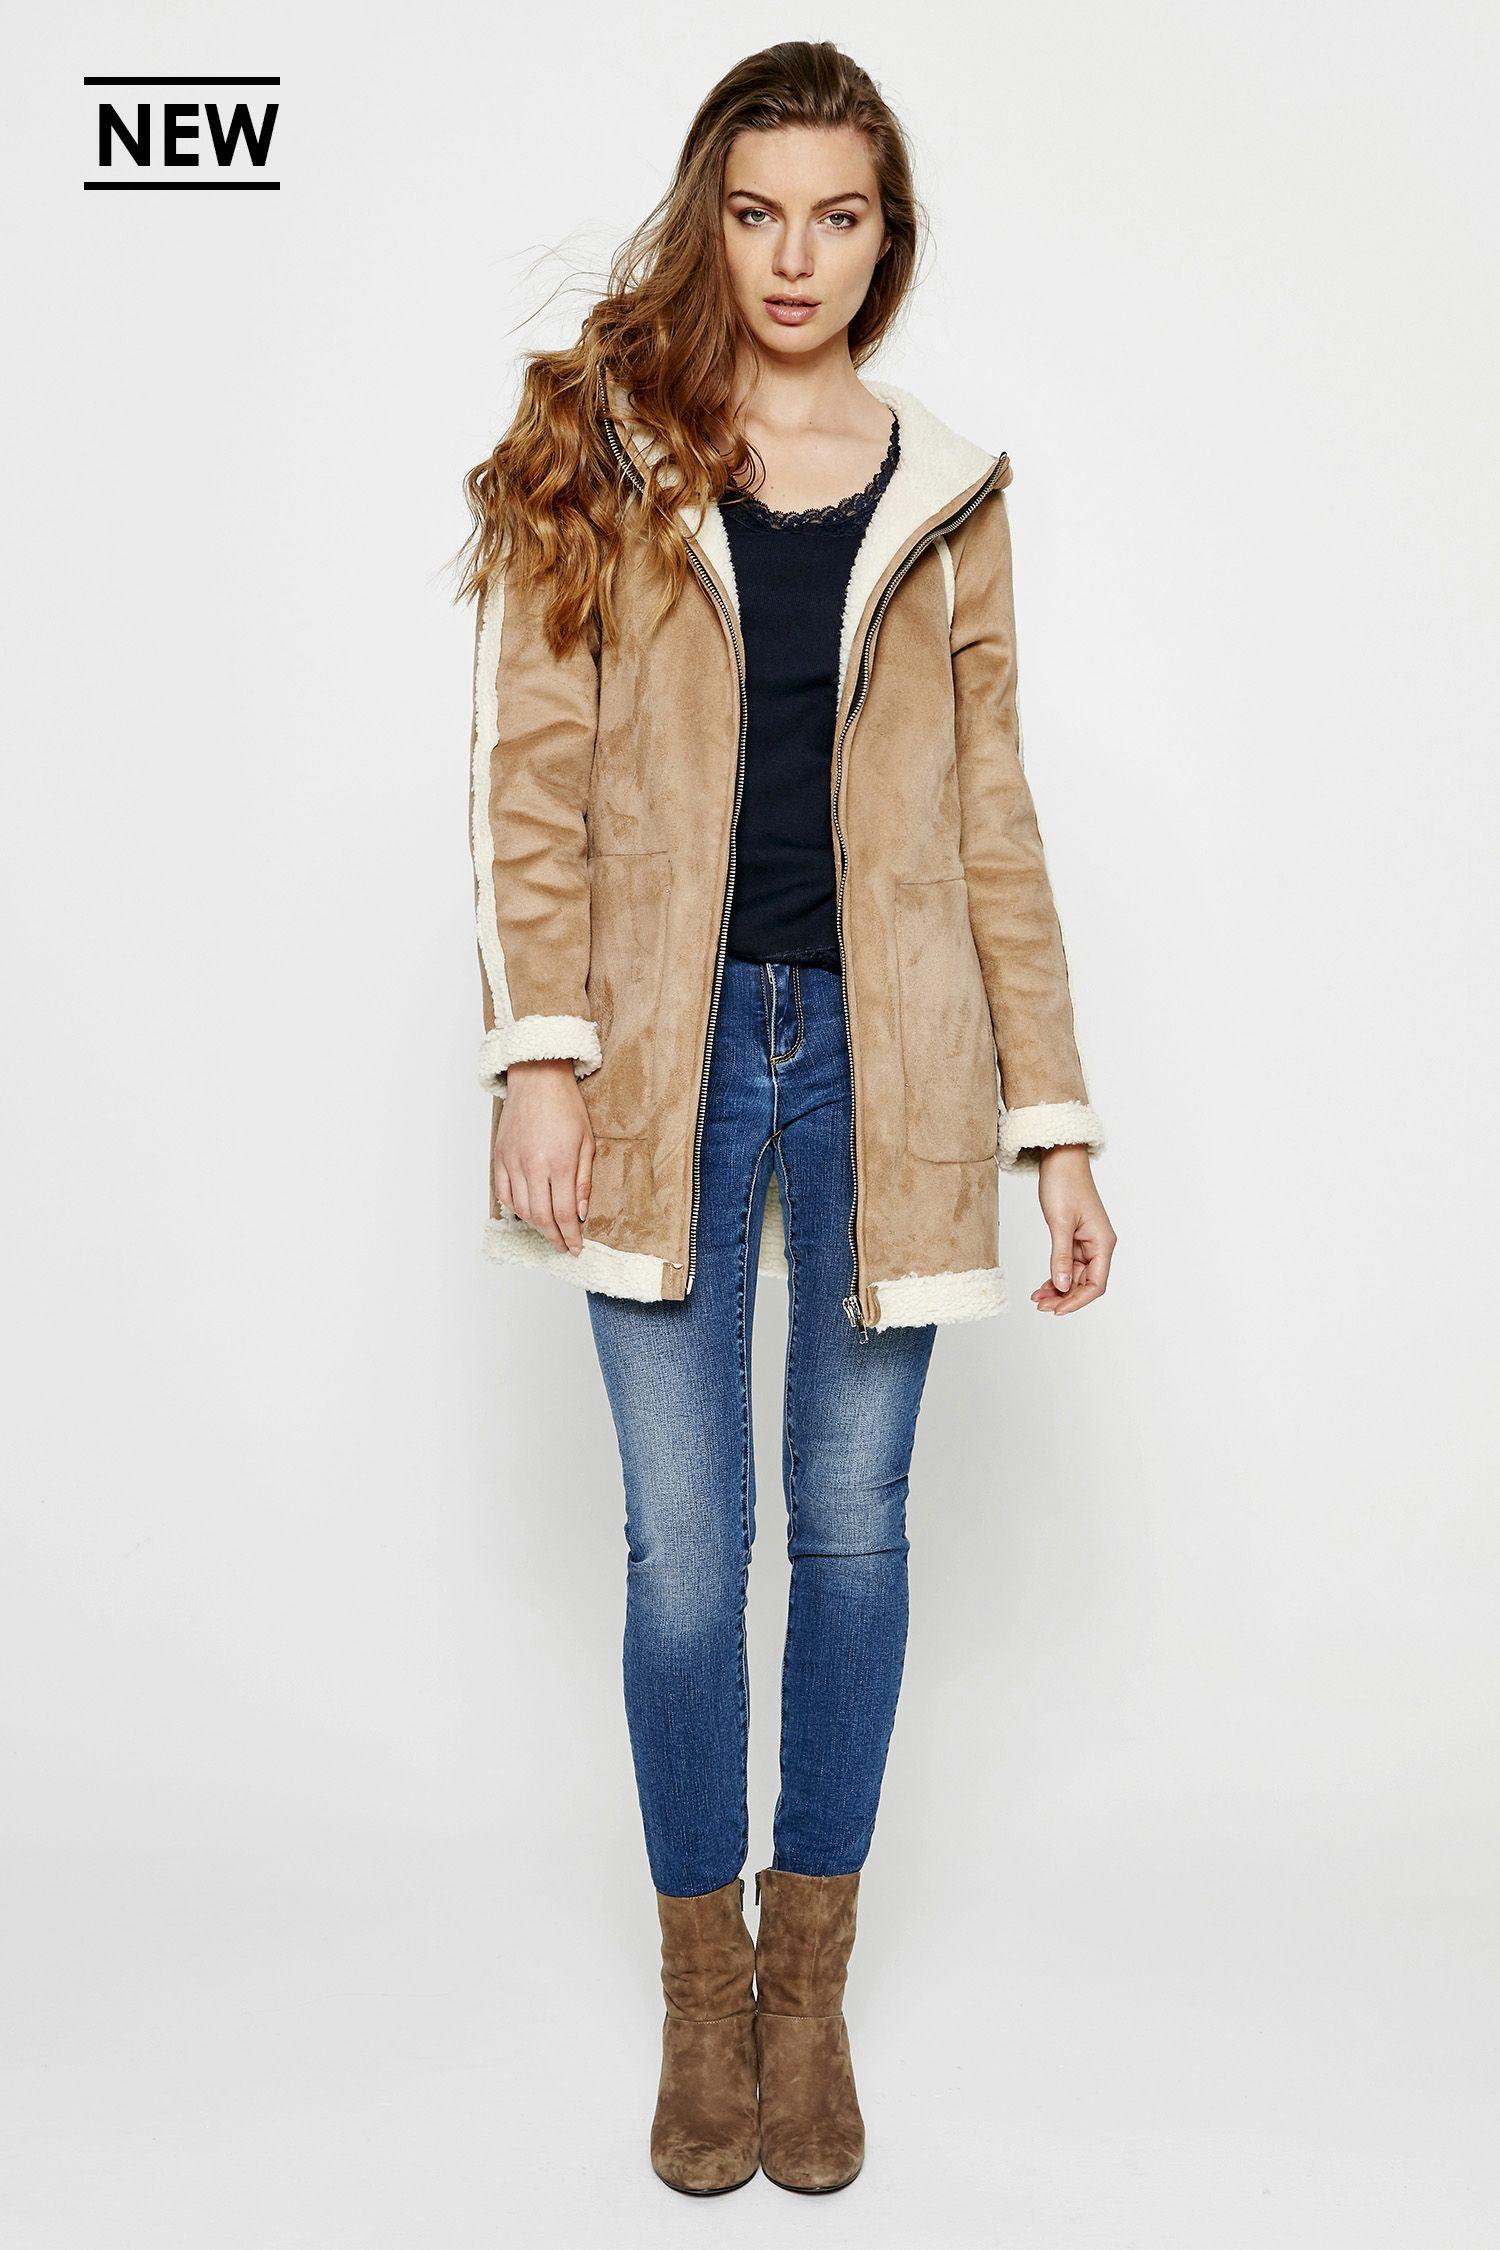 Manteau ddp femme beige